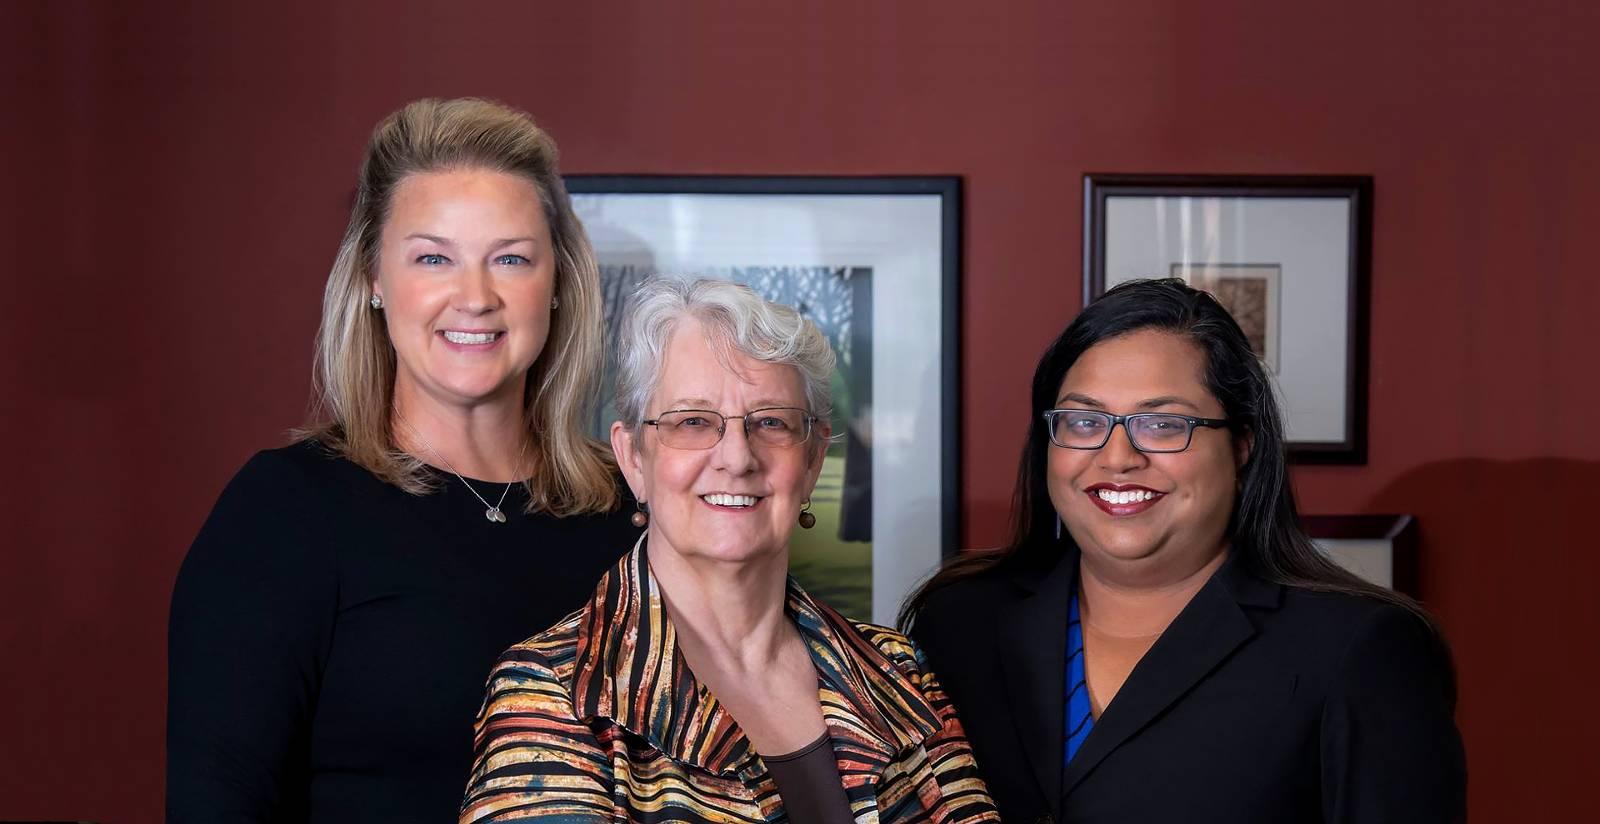 Brigitte Bell Evanston Family Law Attorney and team